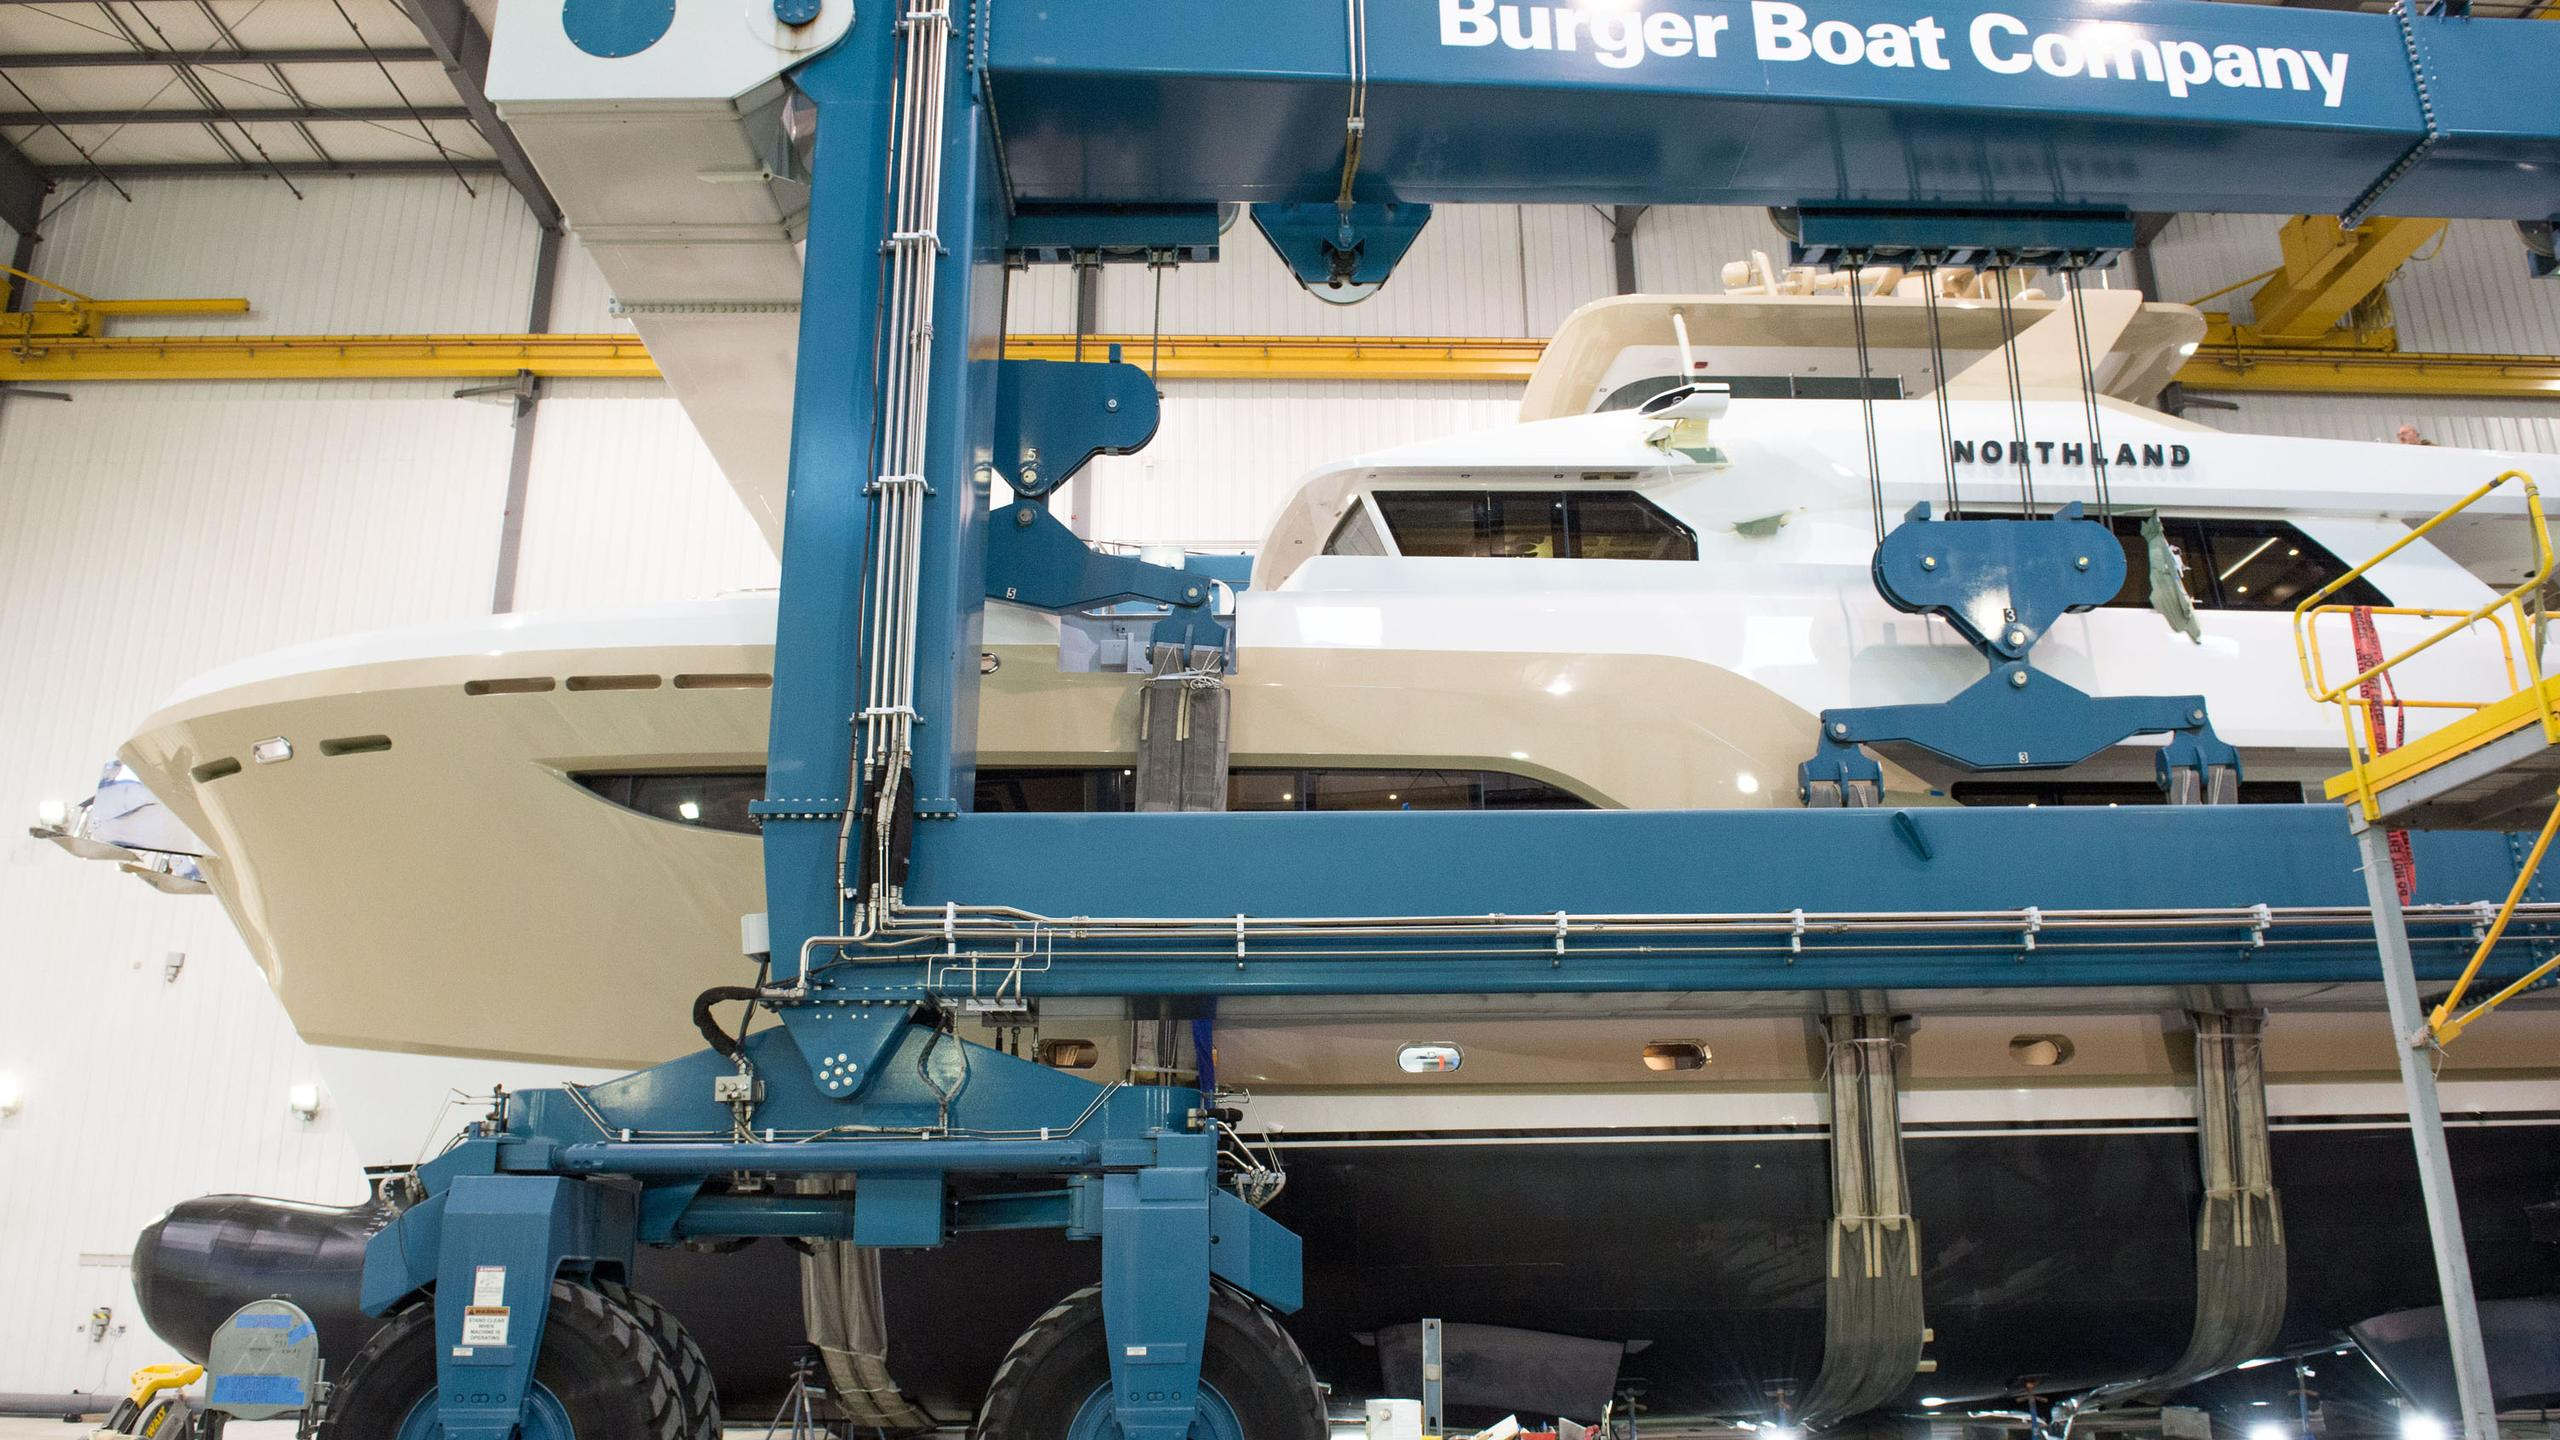 northland motoryacht burger boat 2017 32m launch profile